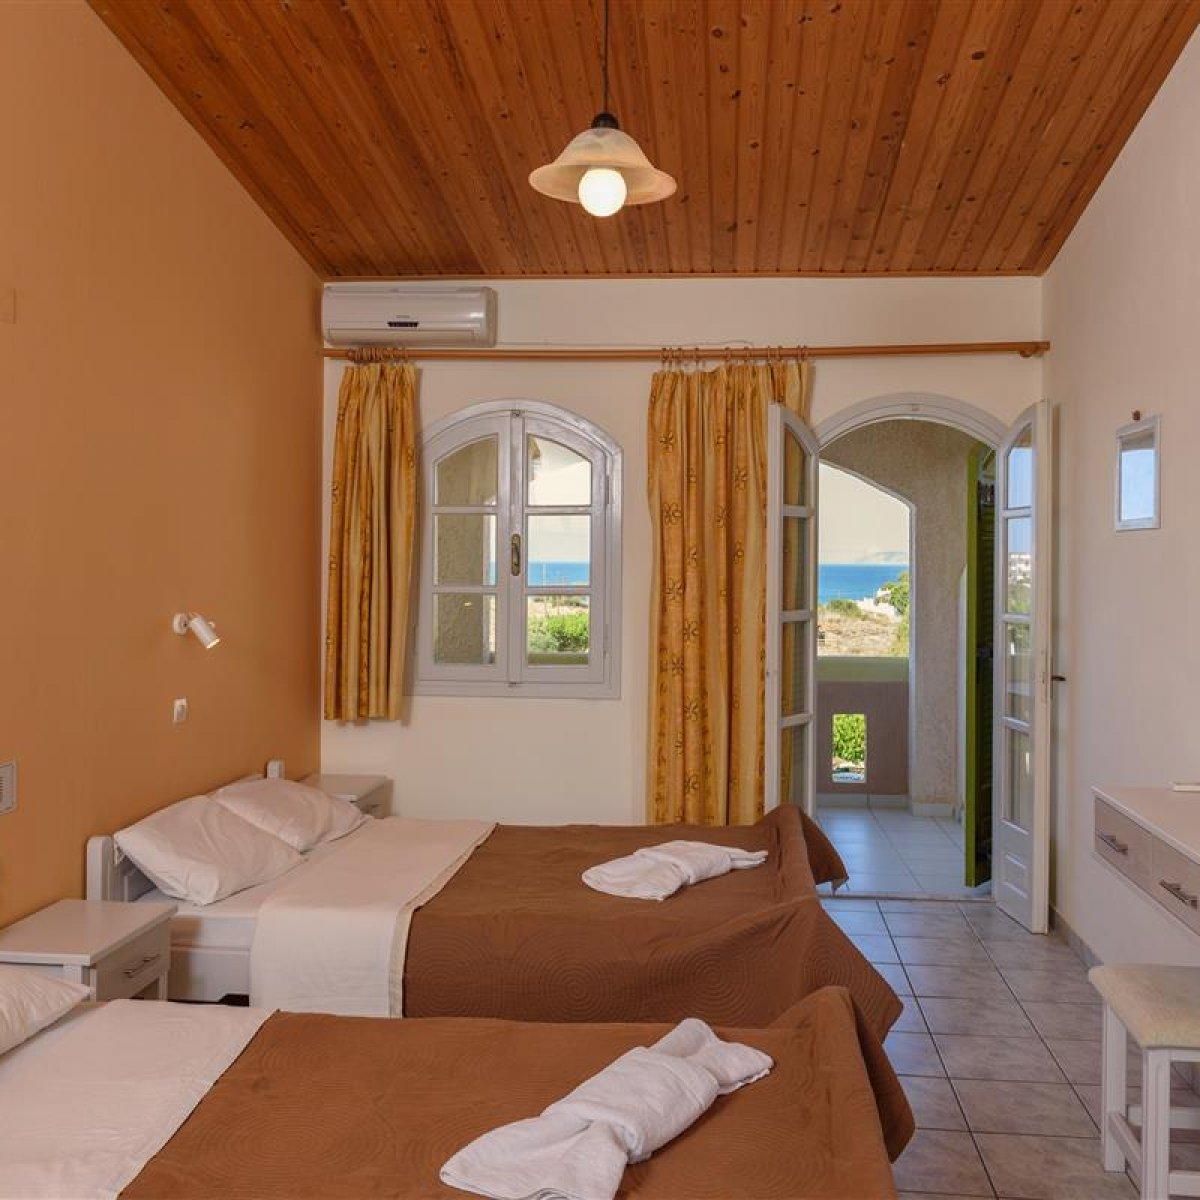 Hotel Kiklamino - Standard Room